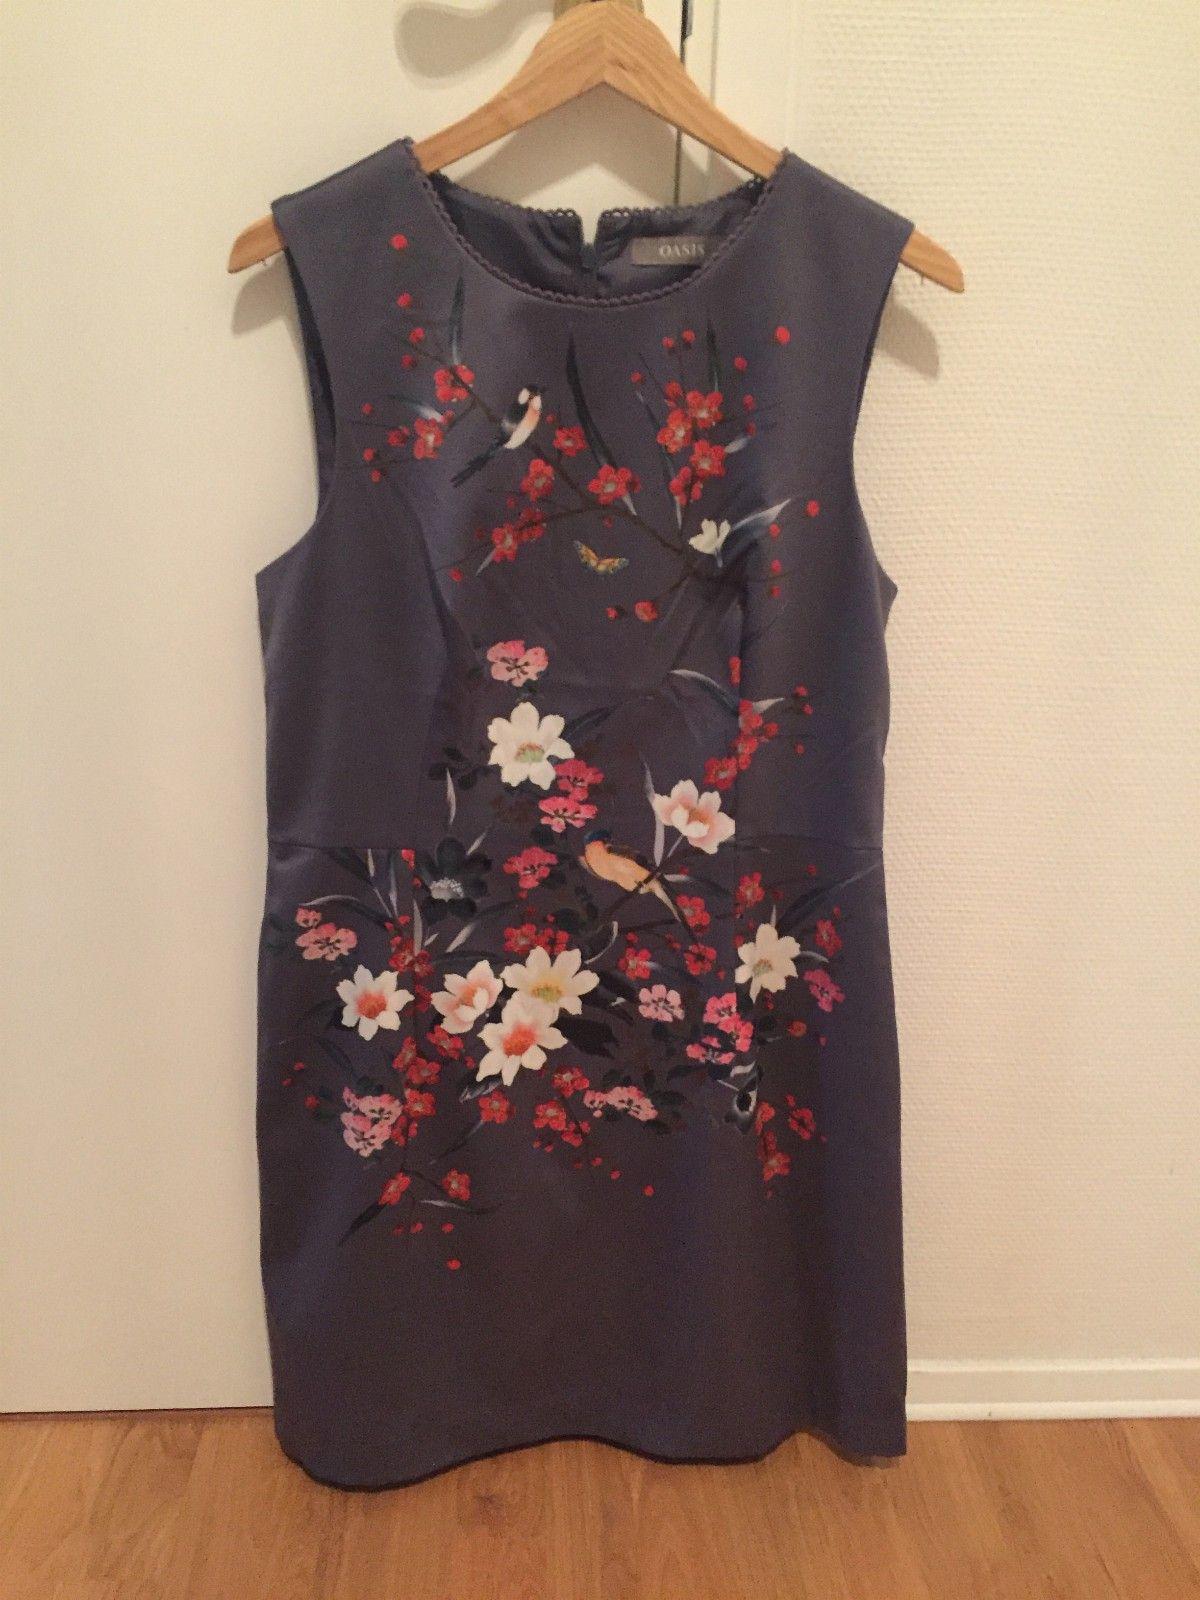 c4cb6f55 Find kjole fra oasis. Shop every store on the internet via PricePi.com